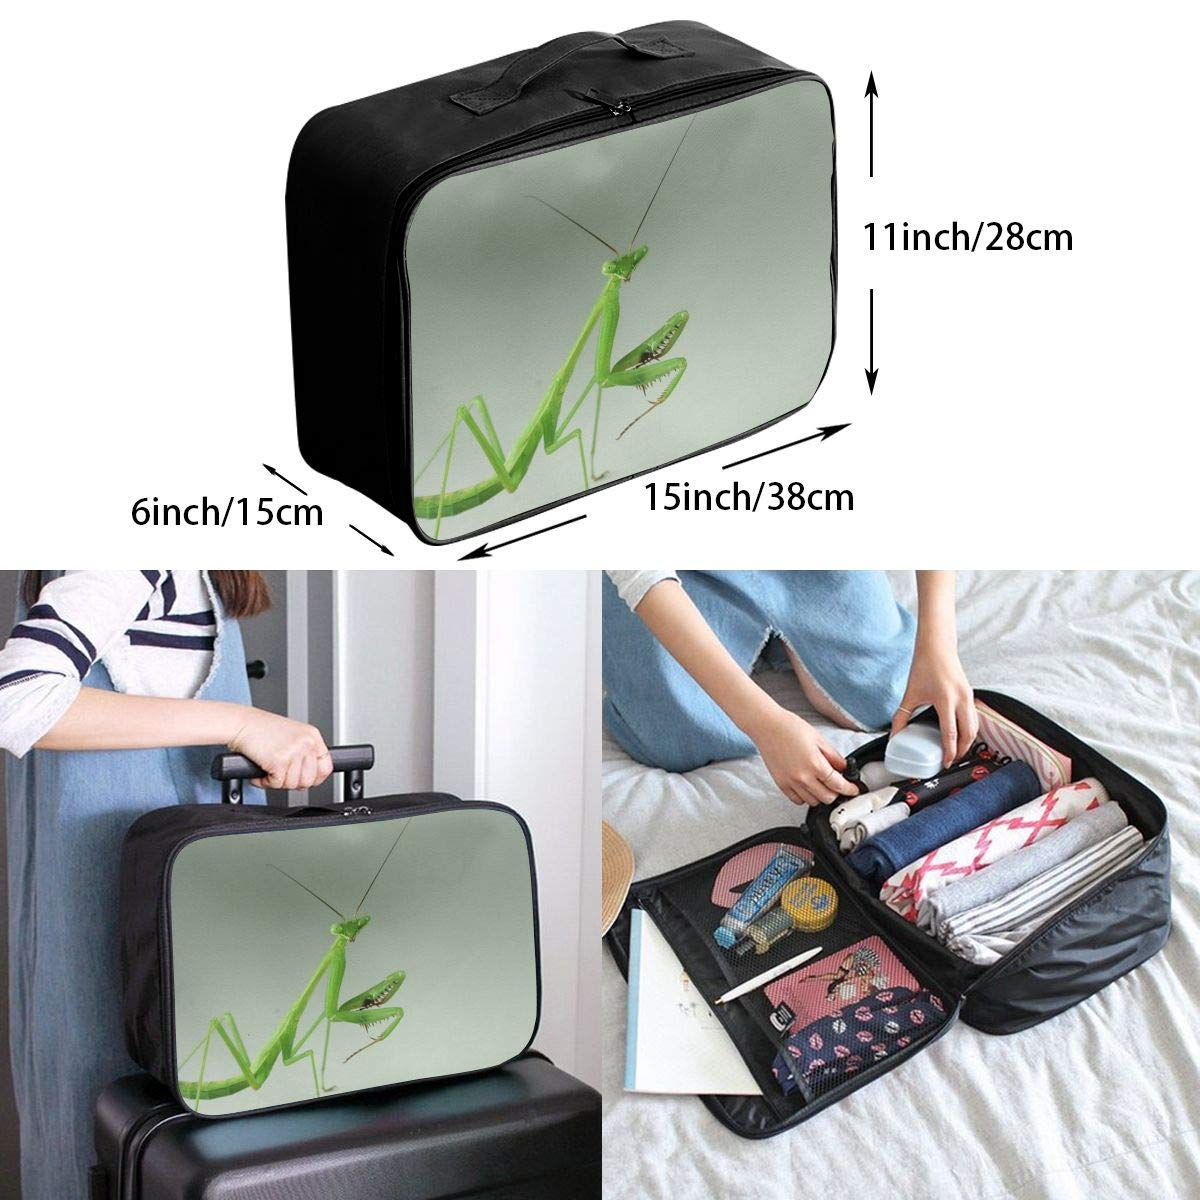 Lightweight Large Capacity Portable Duffel Bag for Men /& Women Green Praying-mantis Travel Duffel Bag Backpack JTRVW Luggage Bags for Travel